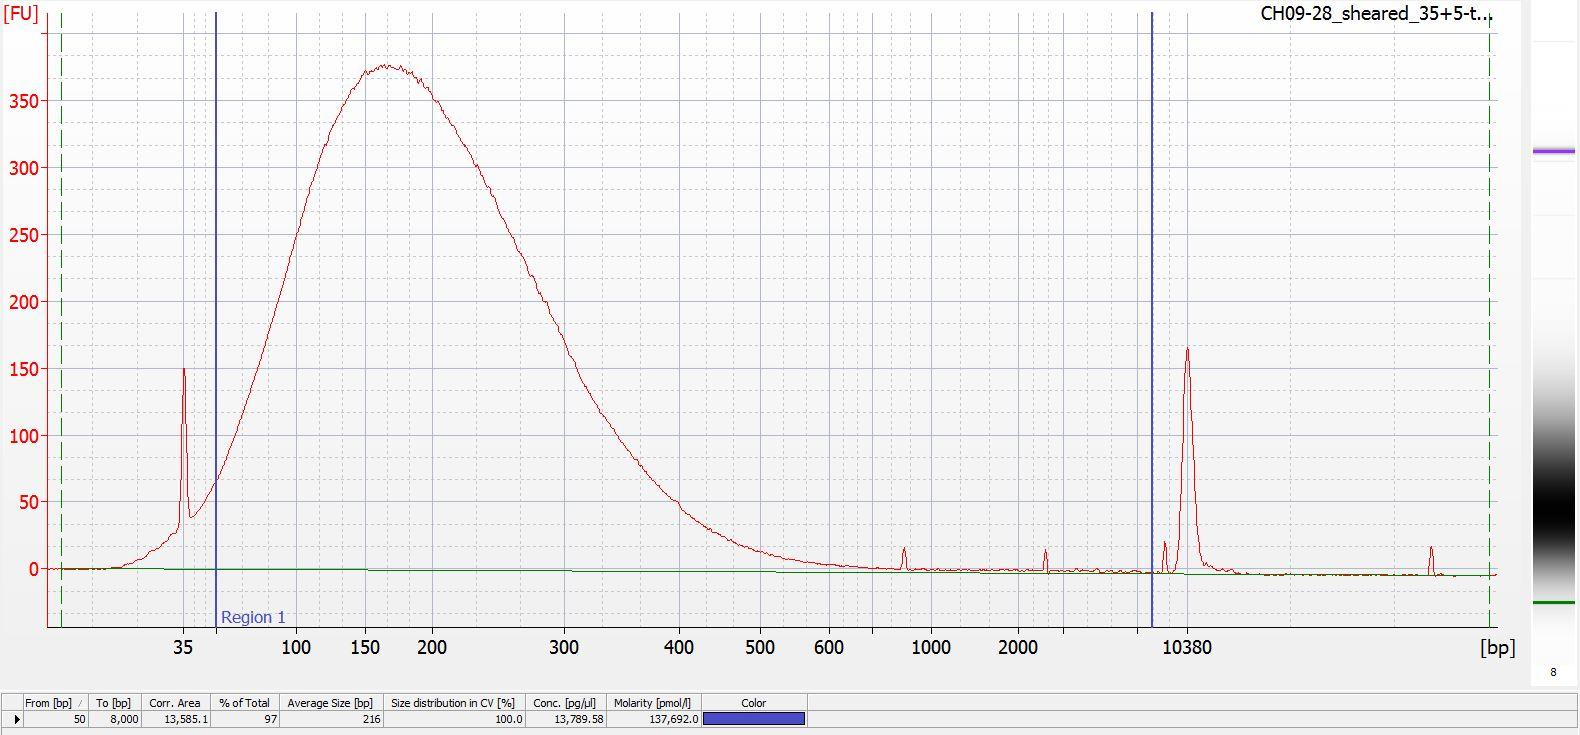 Sheared CH09-28 Bioanalyzer electropherogram